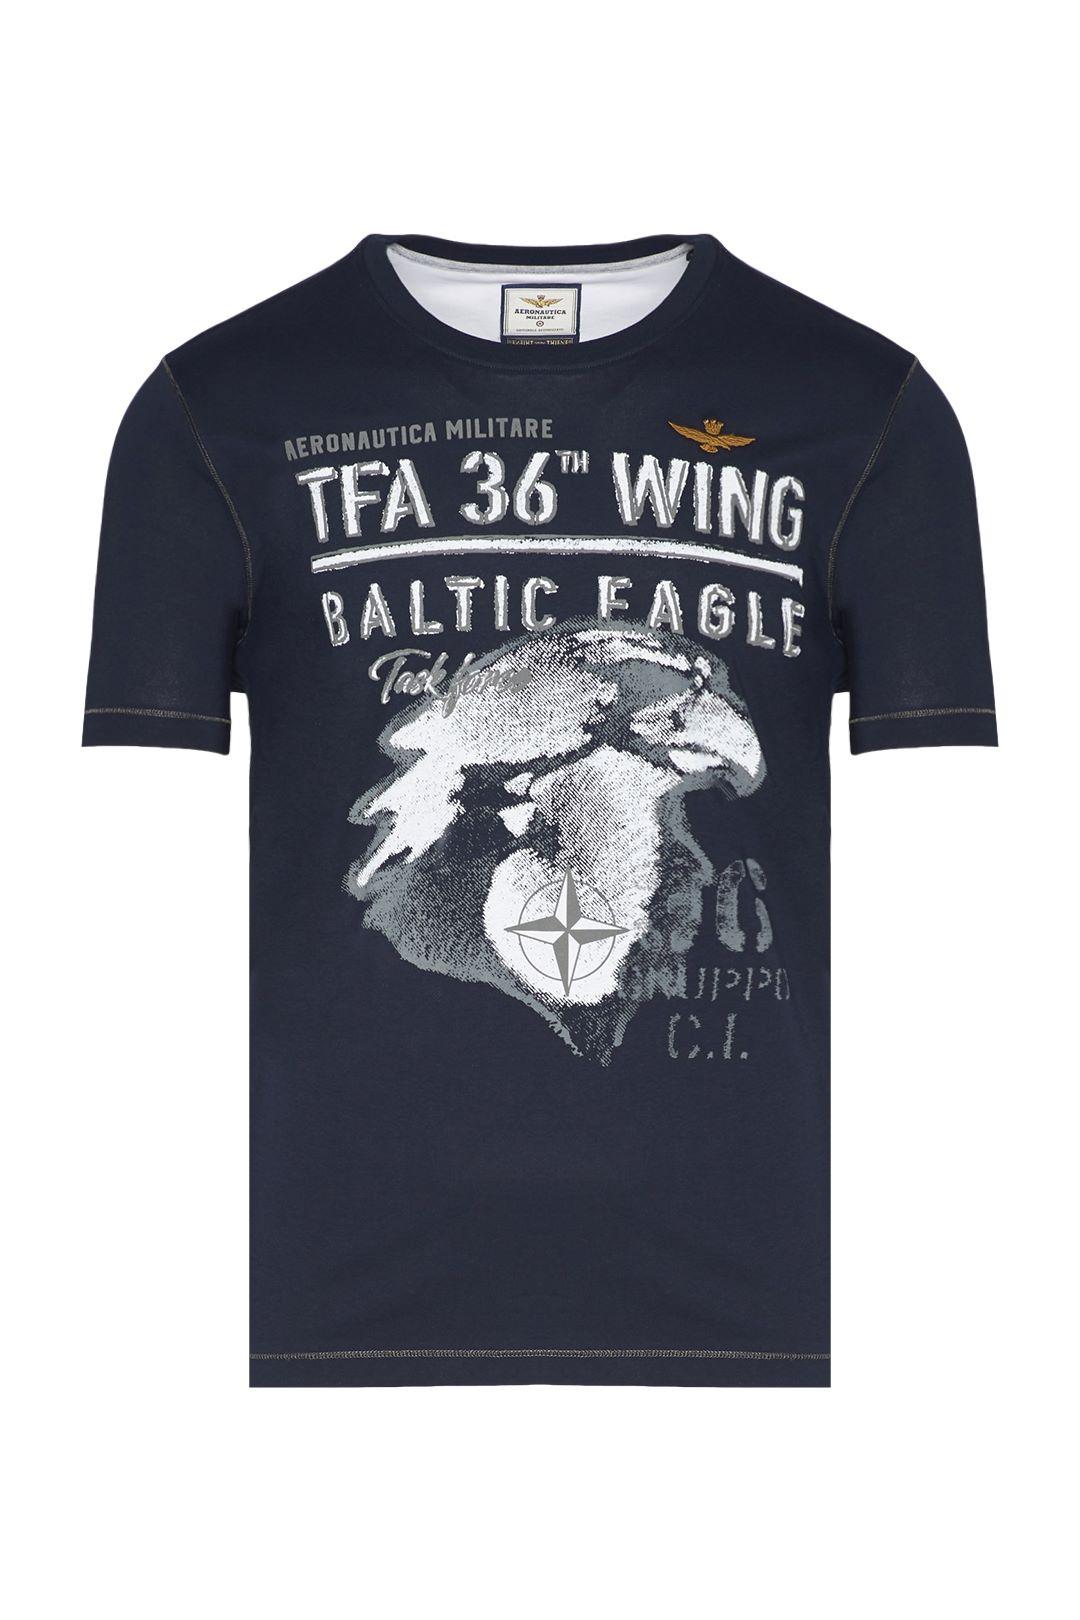 TS1855 - T-SHIRT M.C. 1